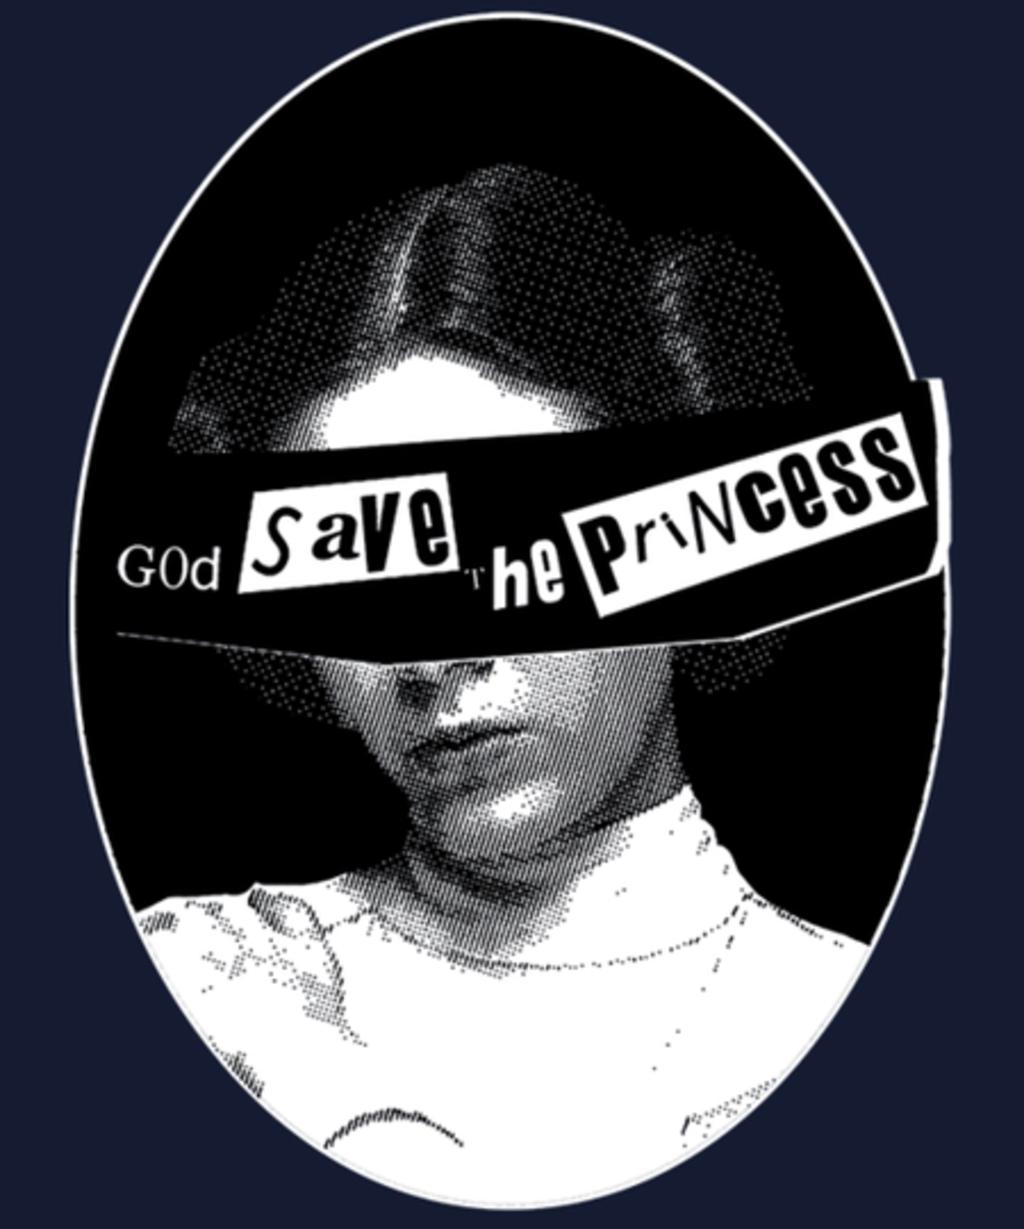 Qwertee: God Save the Princess